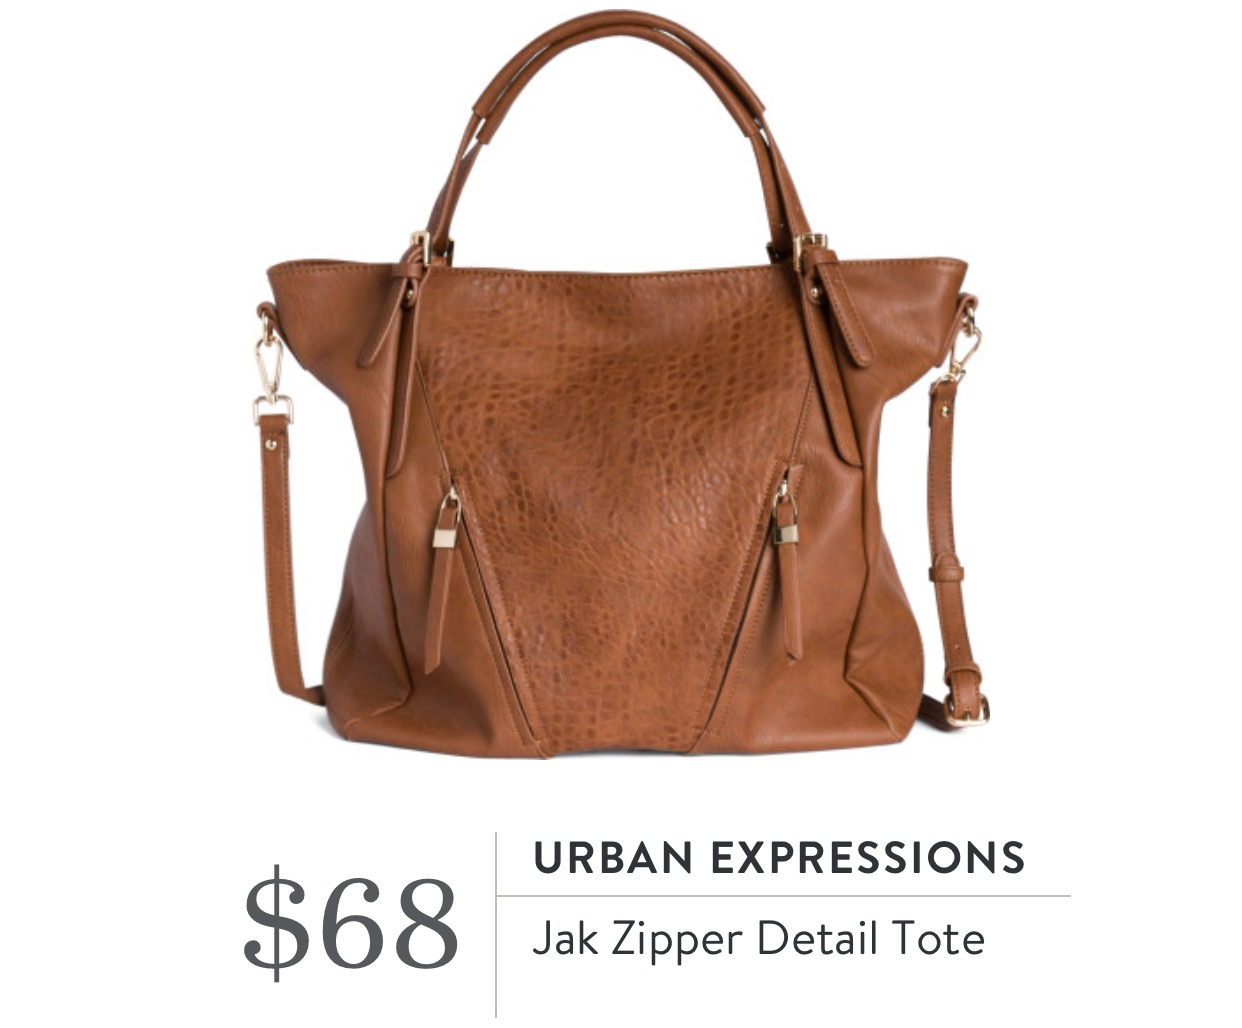 Jak Zipper Detail Tote - Urban Expressions